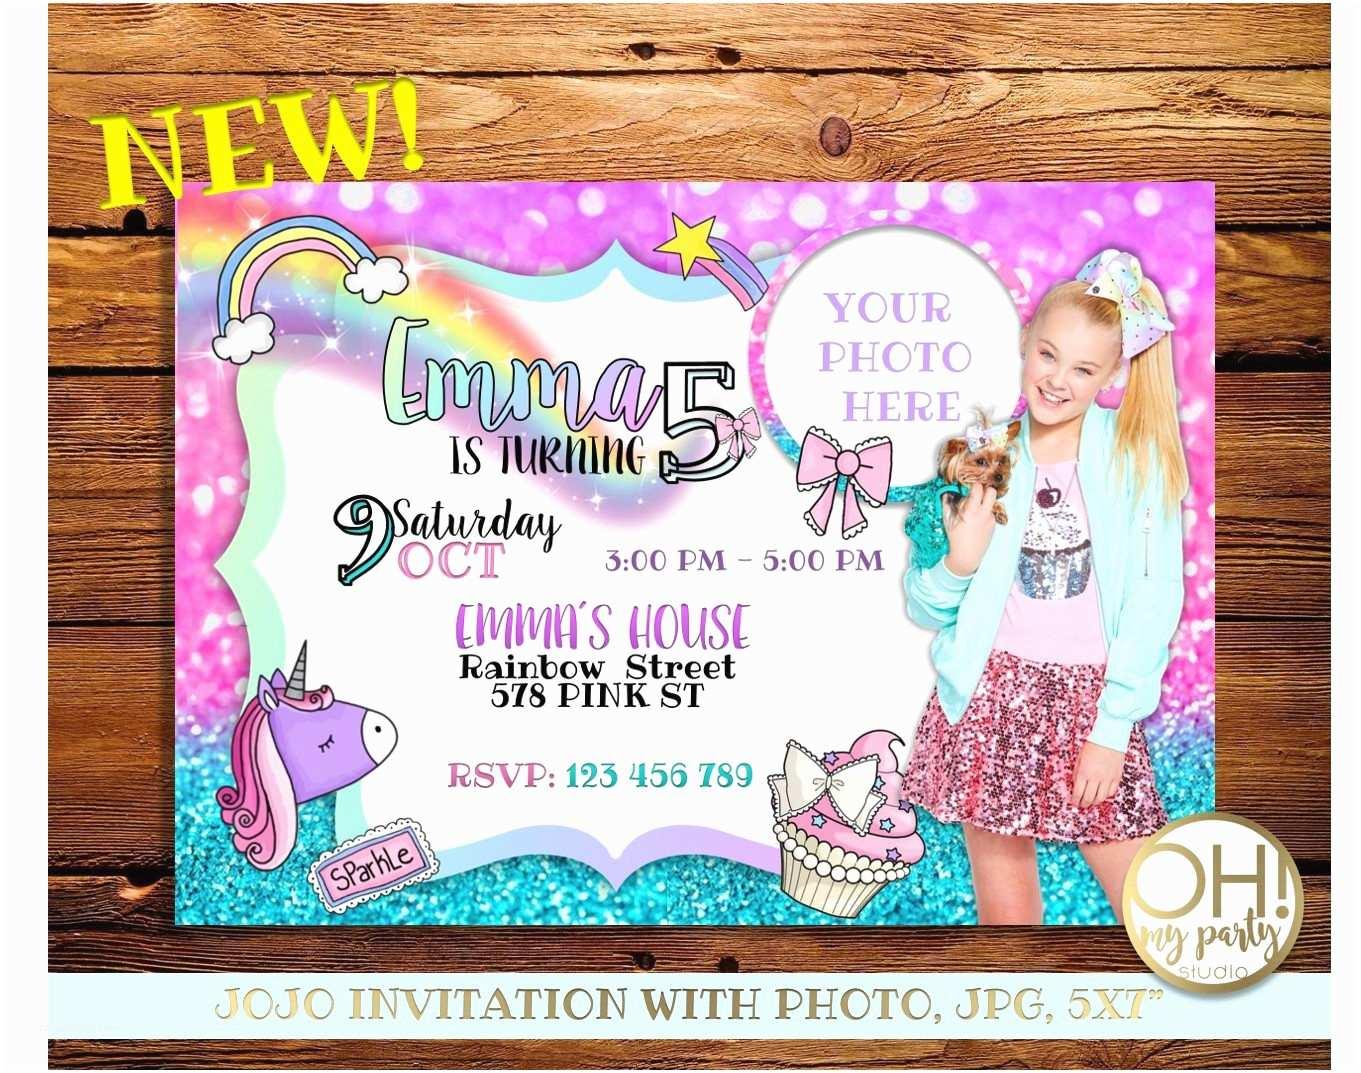 Jojo Siwa Party Invitations Jojo Siwa Birthday Invitation with Photo Jojo Siwa Party